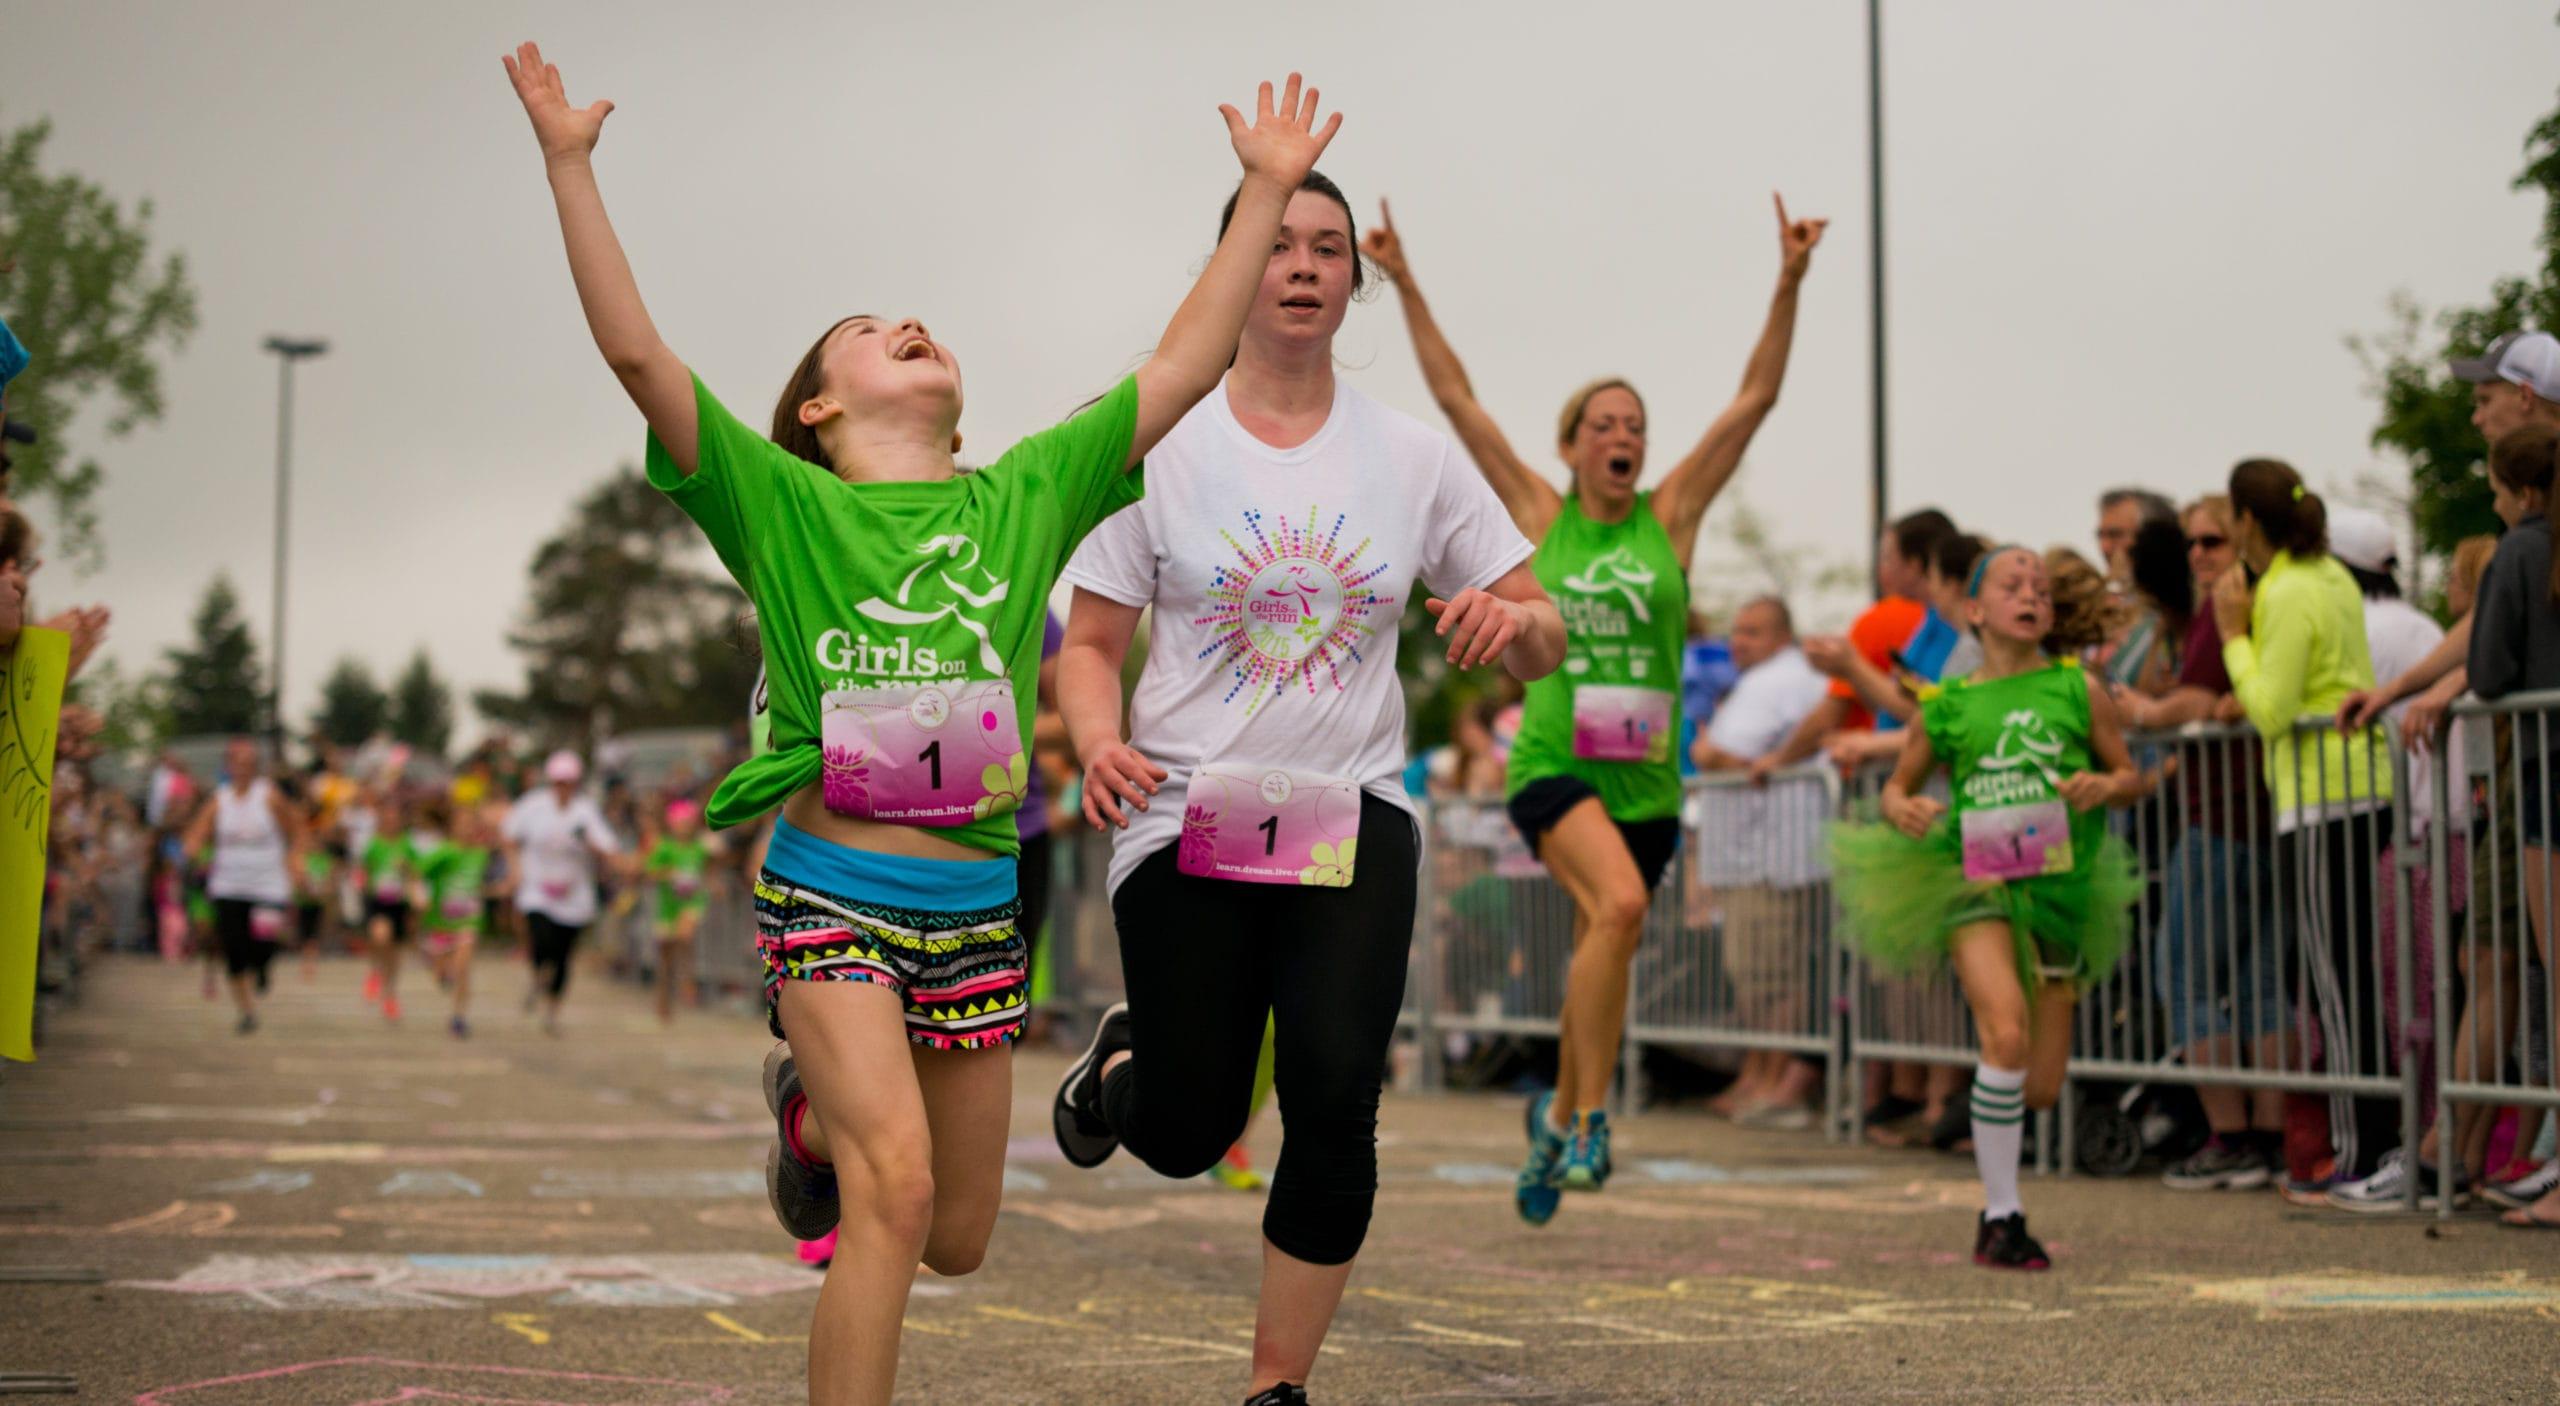 Girl finishing a 5K at a Girls On the Run 5K.